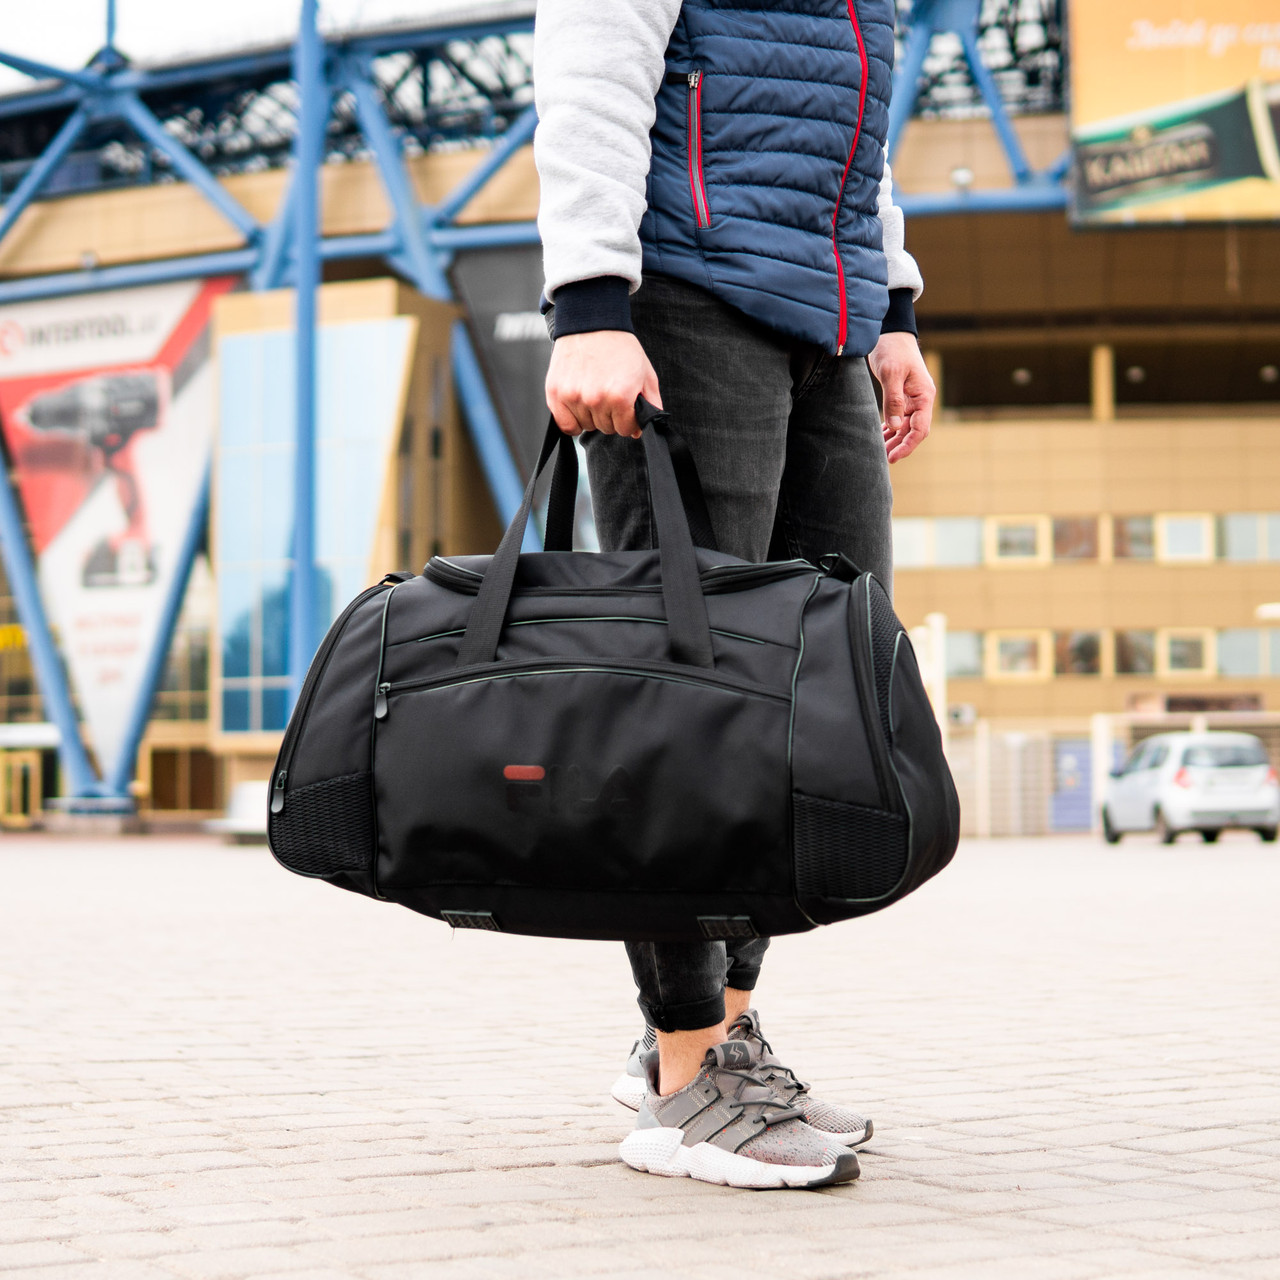 Чоловіча спортивна сумка FILA BALANCE